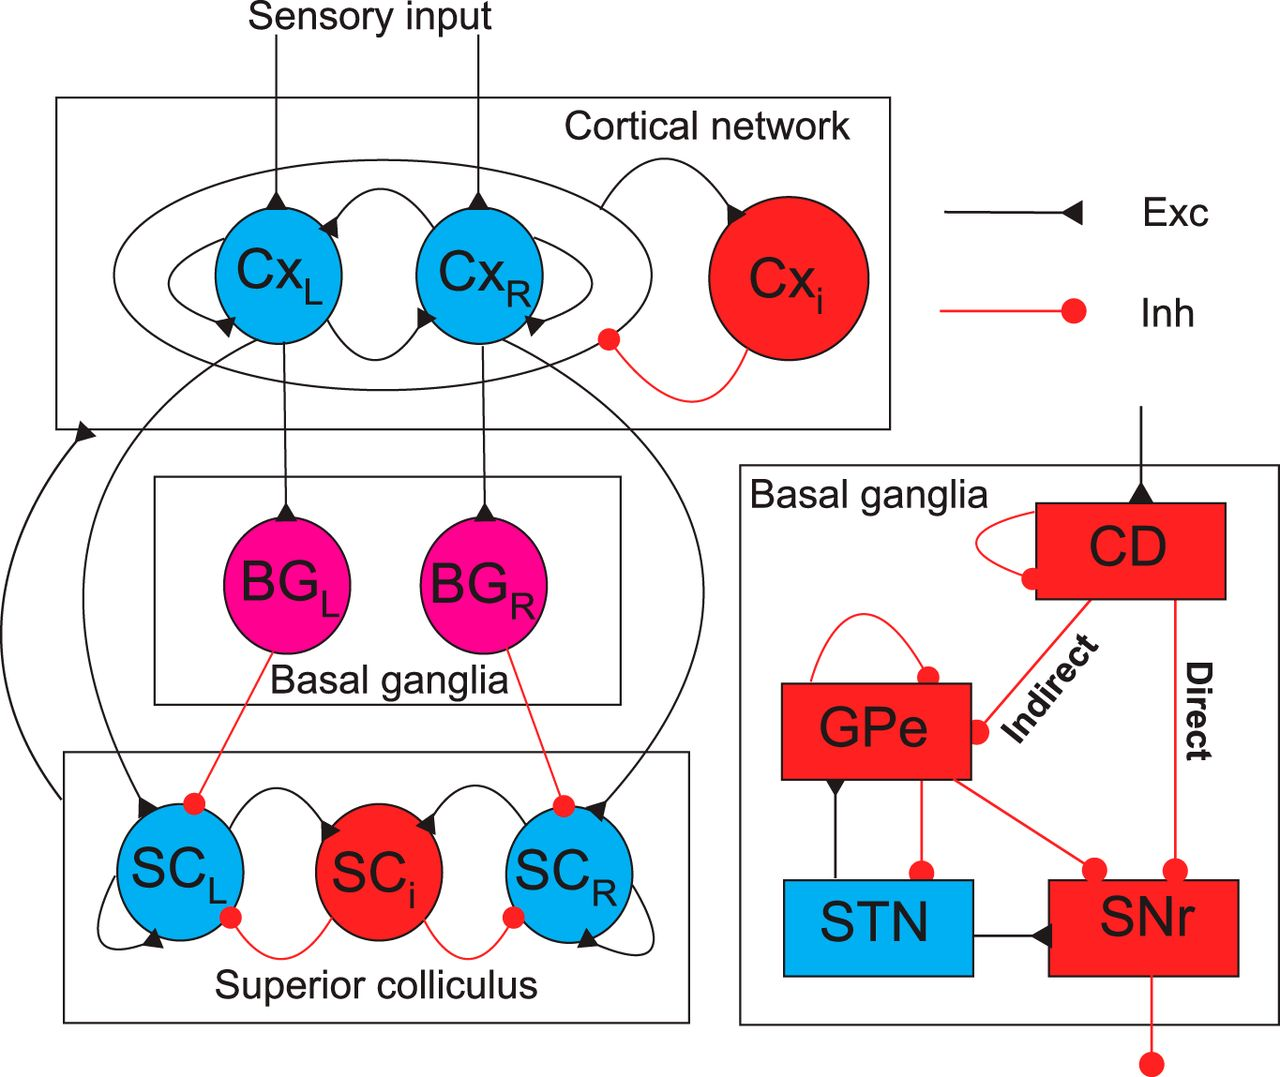 Role Of The Indirect Pathway Basal Ganglia In Perceptual Clark Gcx 25e Wiring Diagram Download Figure